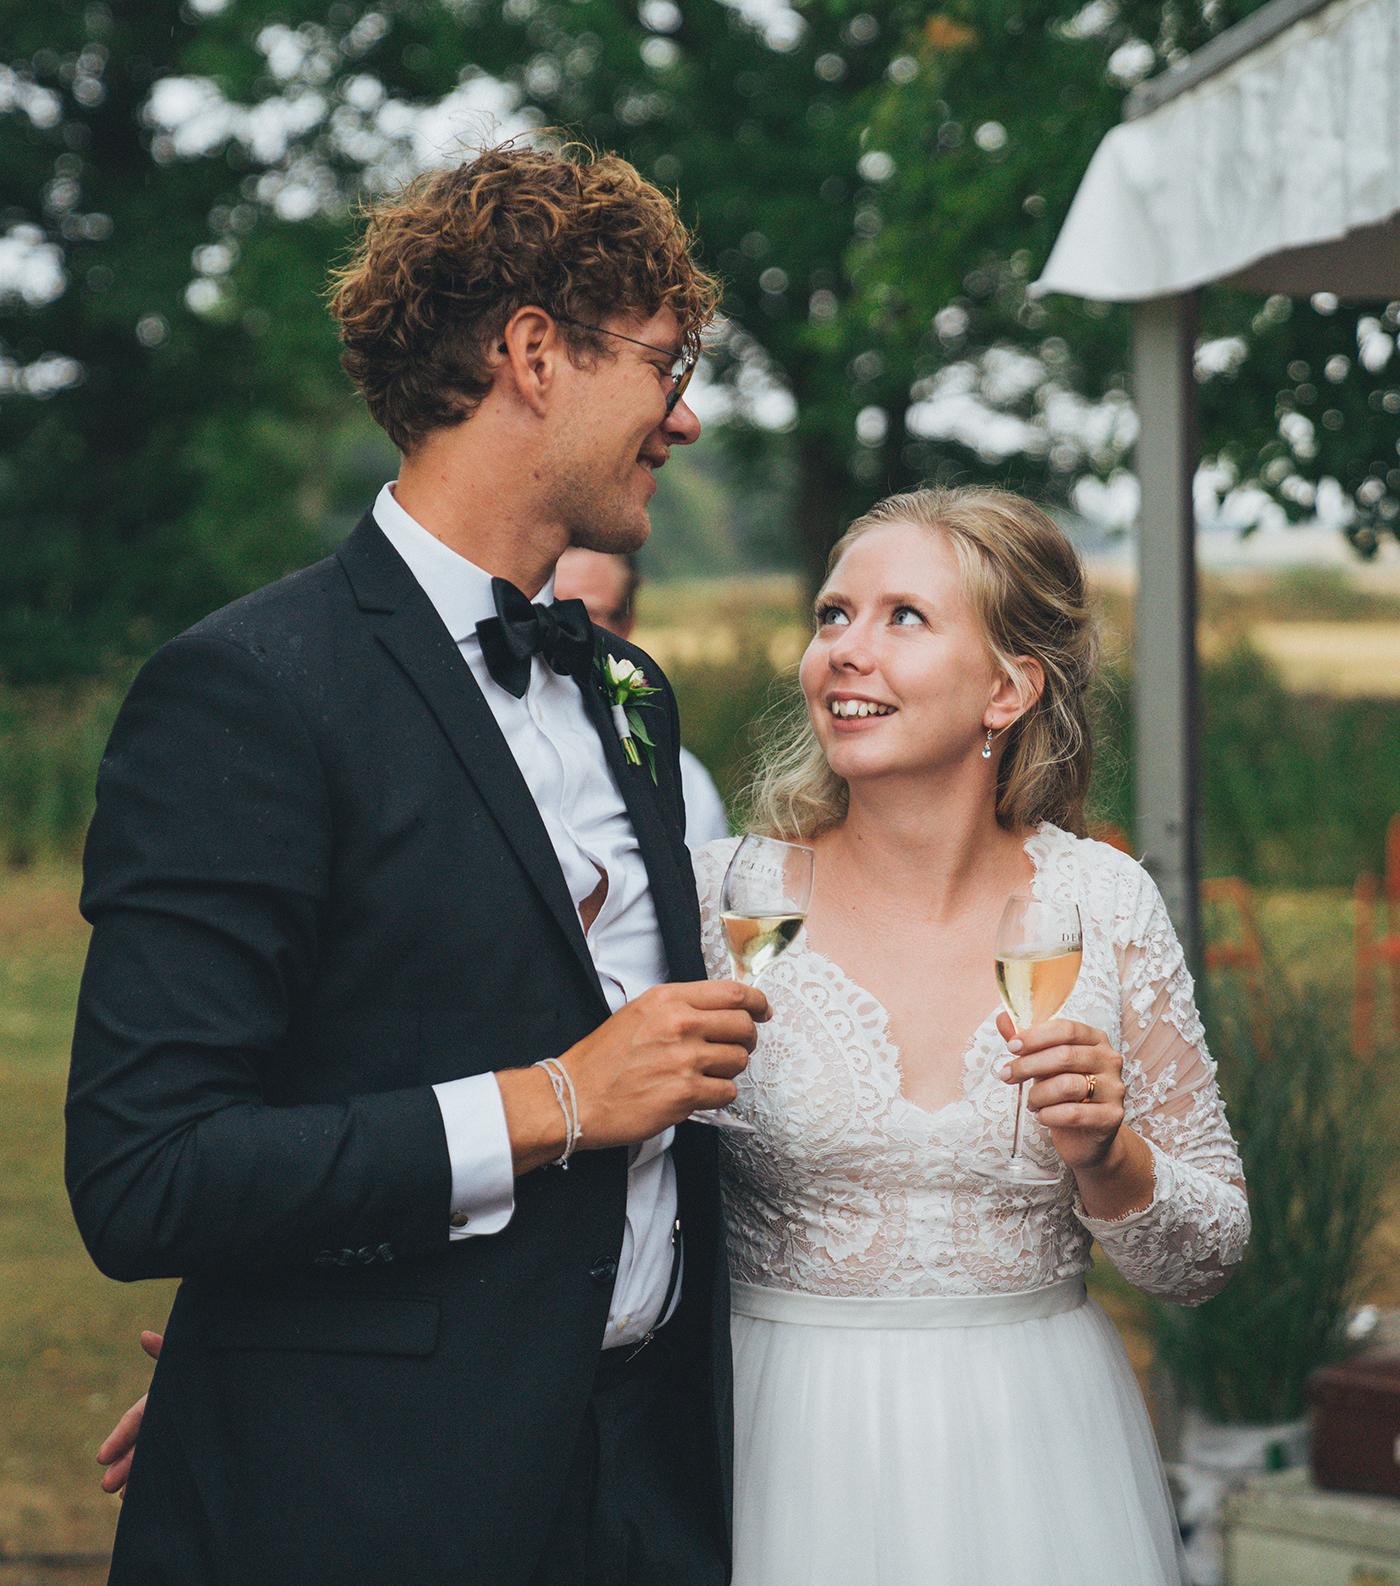 738a5879a7c9 Den ultimata guiden till dig som toastmaster / toastmadame | Isabel  Boltenstern